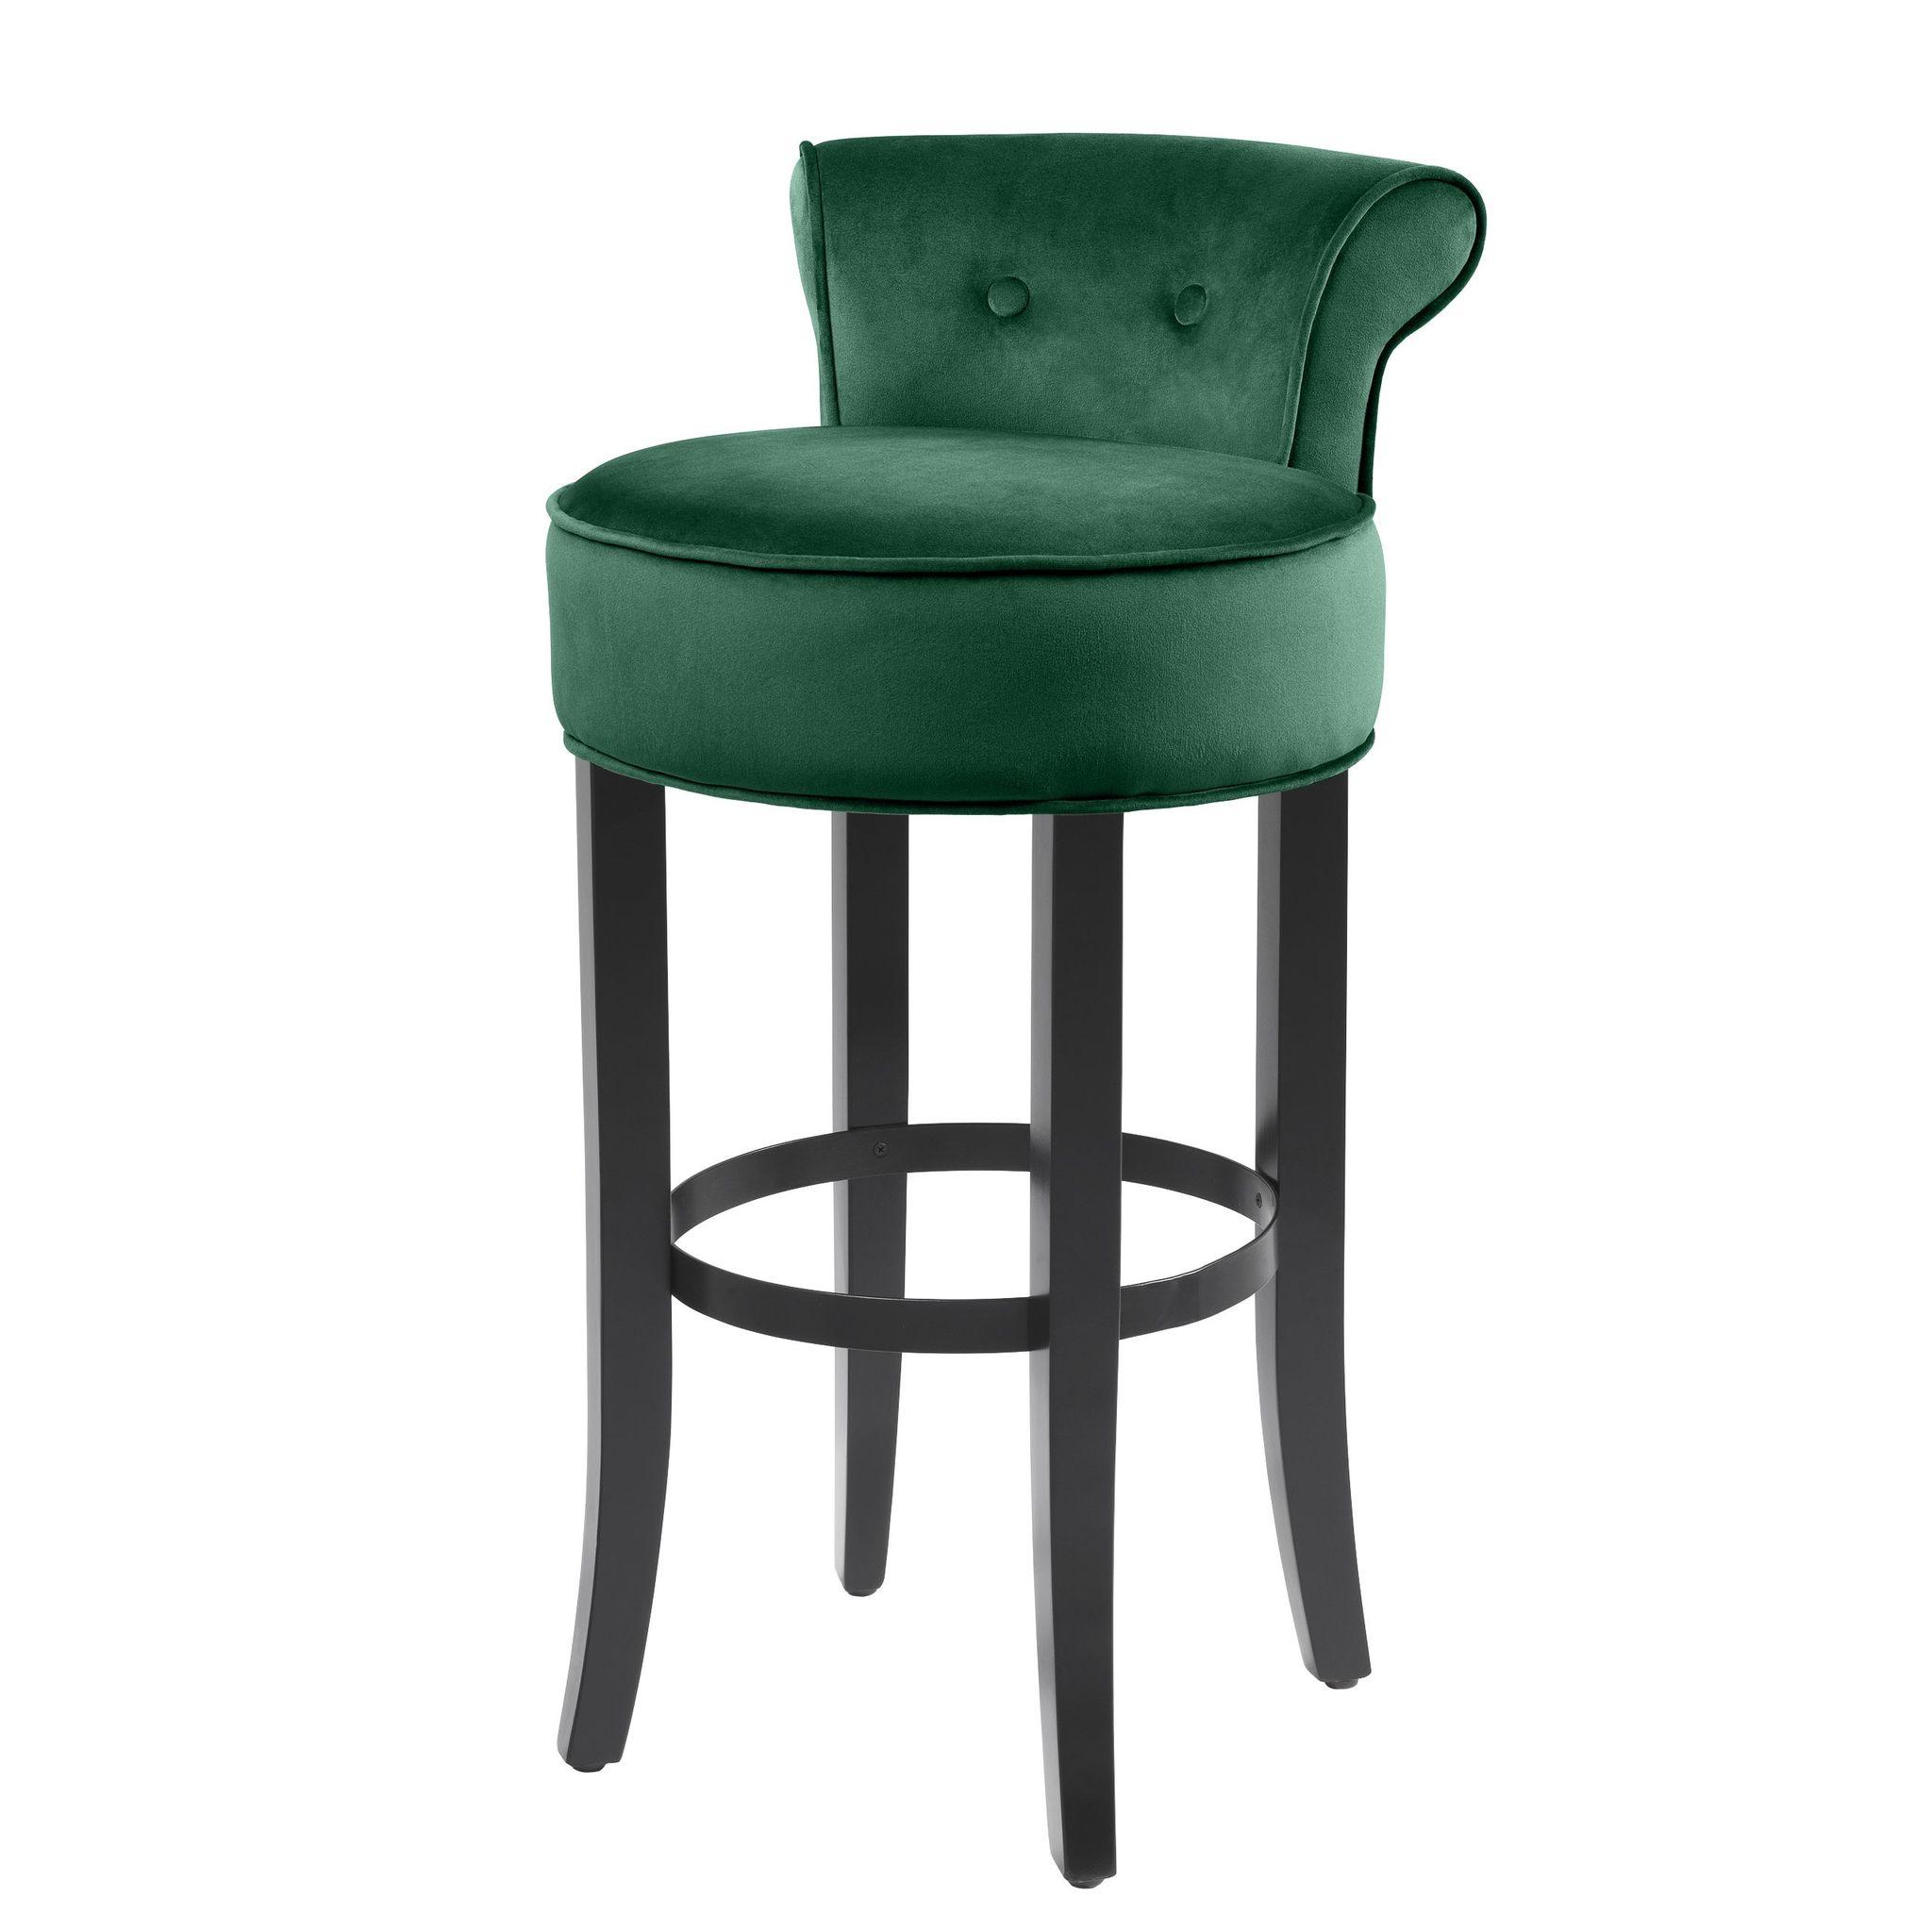 Барный стул Eichholtz 113231 Sophia Loren